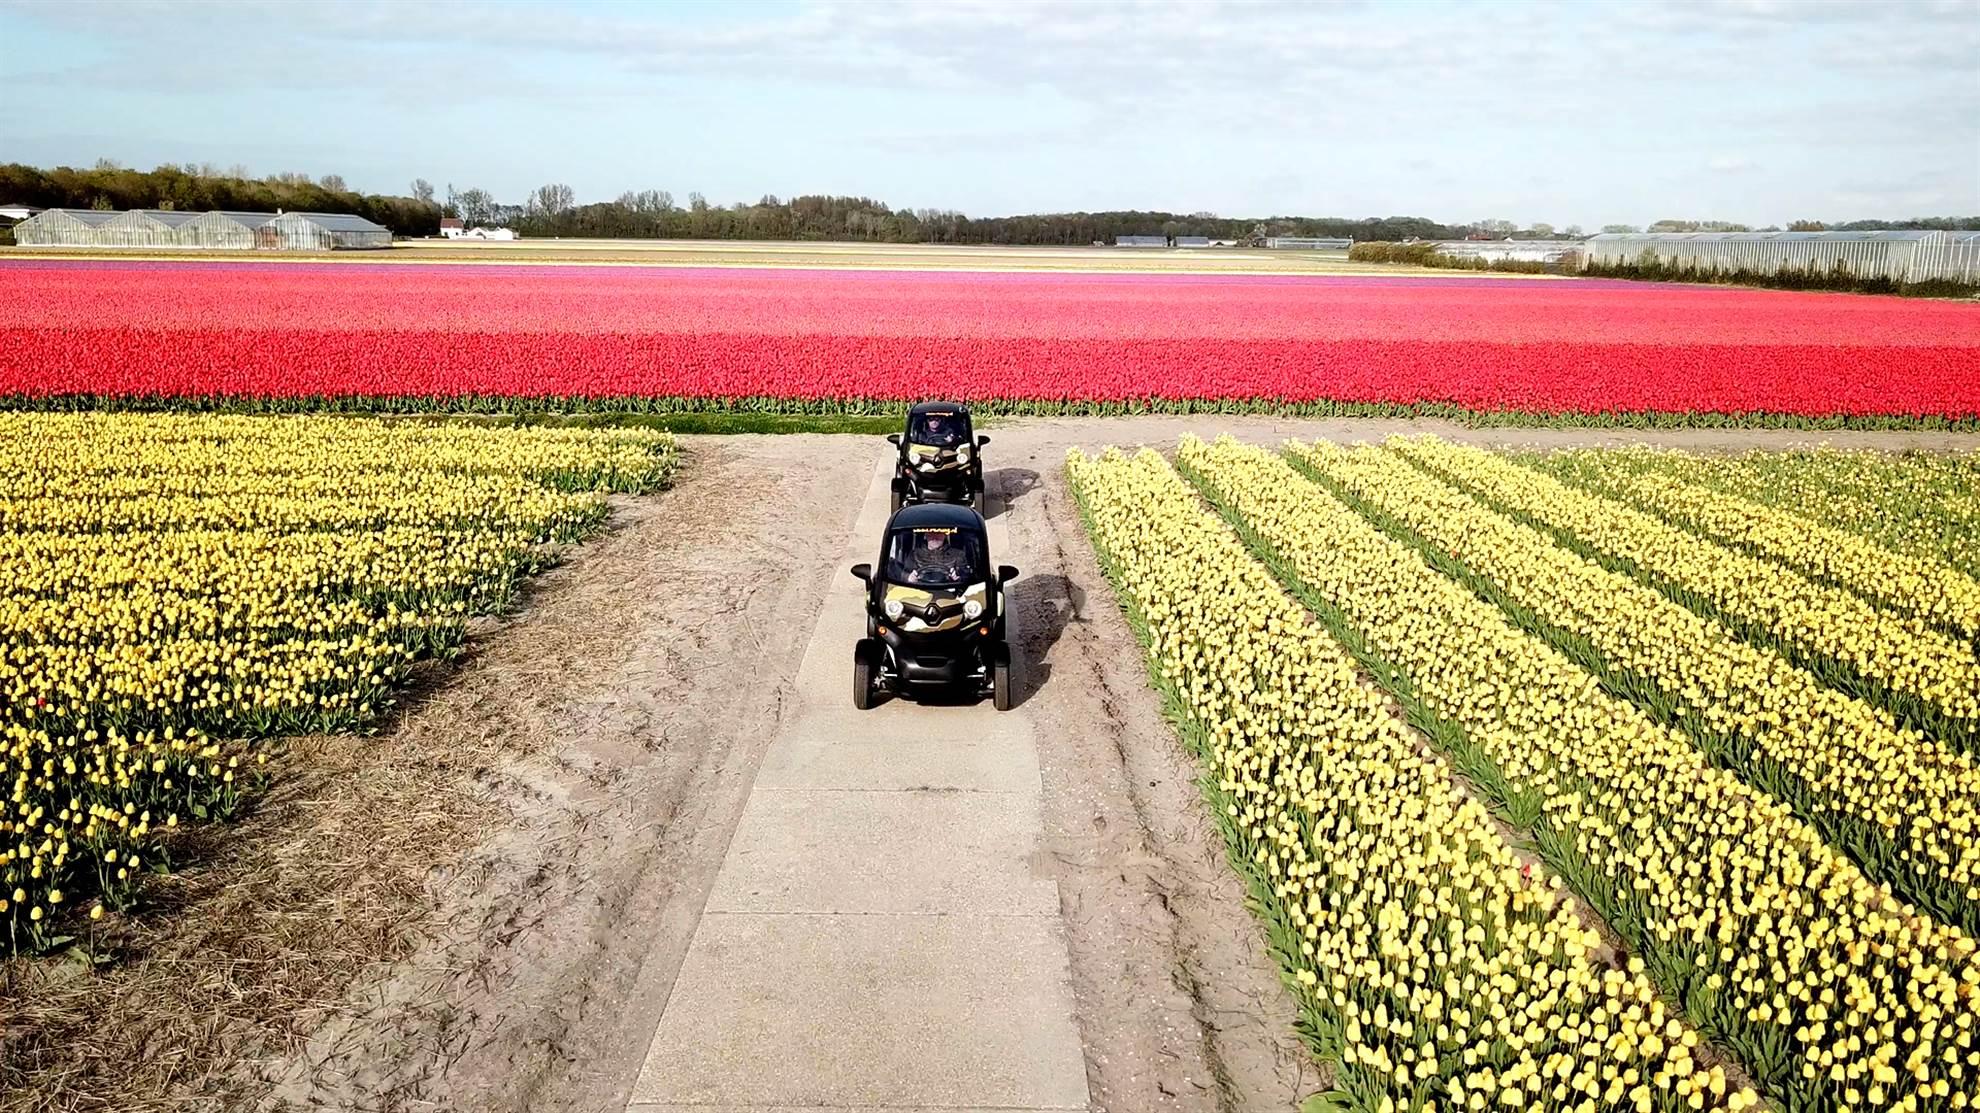 Flowerfield Experience mit Elektrofahrzeug - GPS und Audioguide inklusive